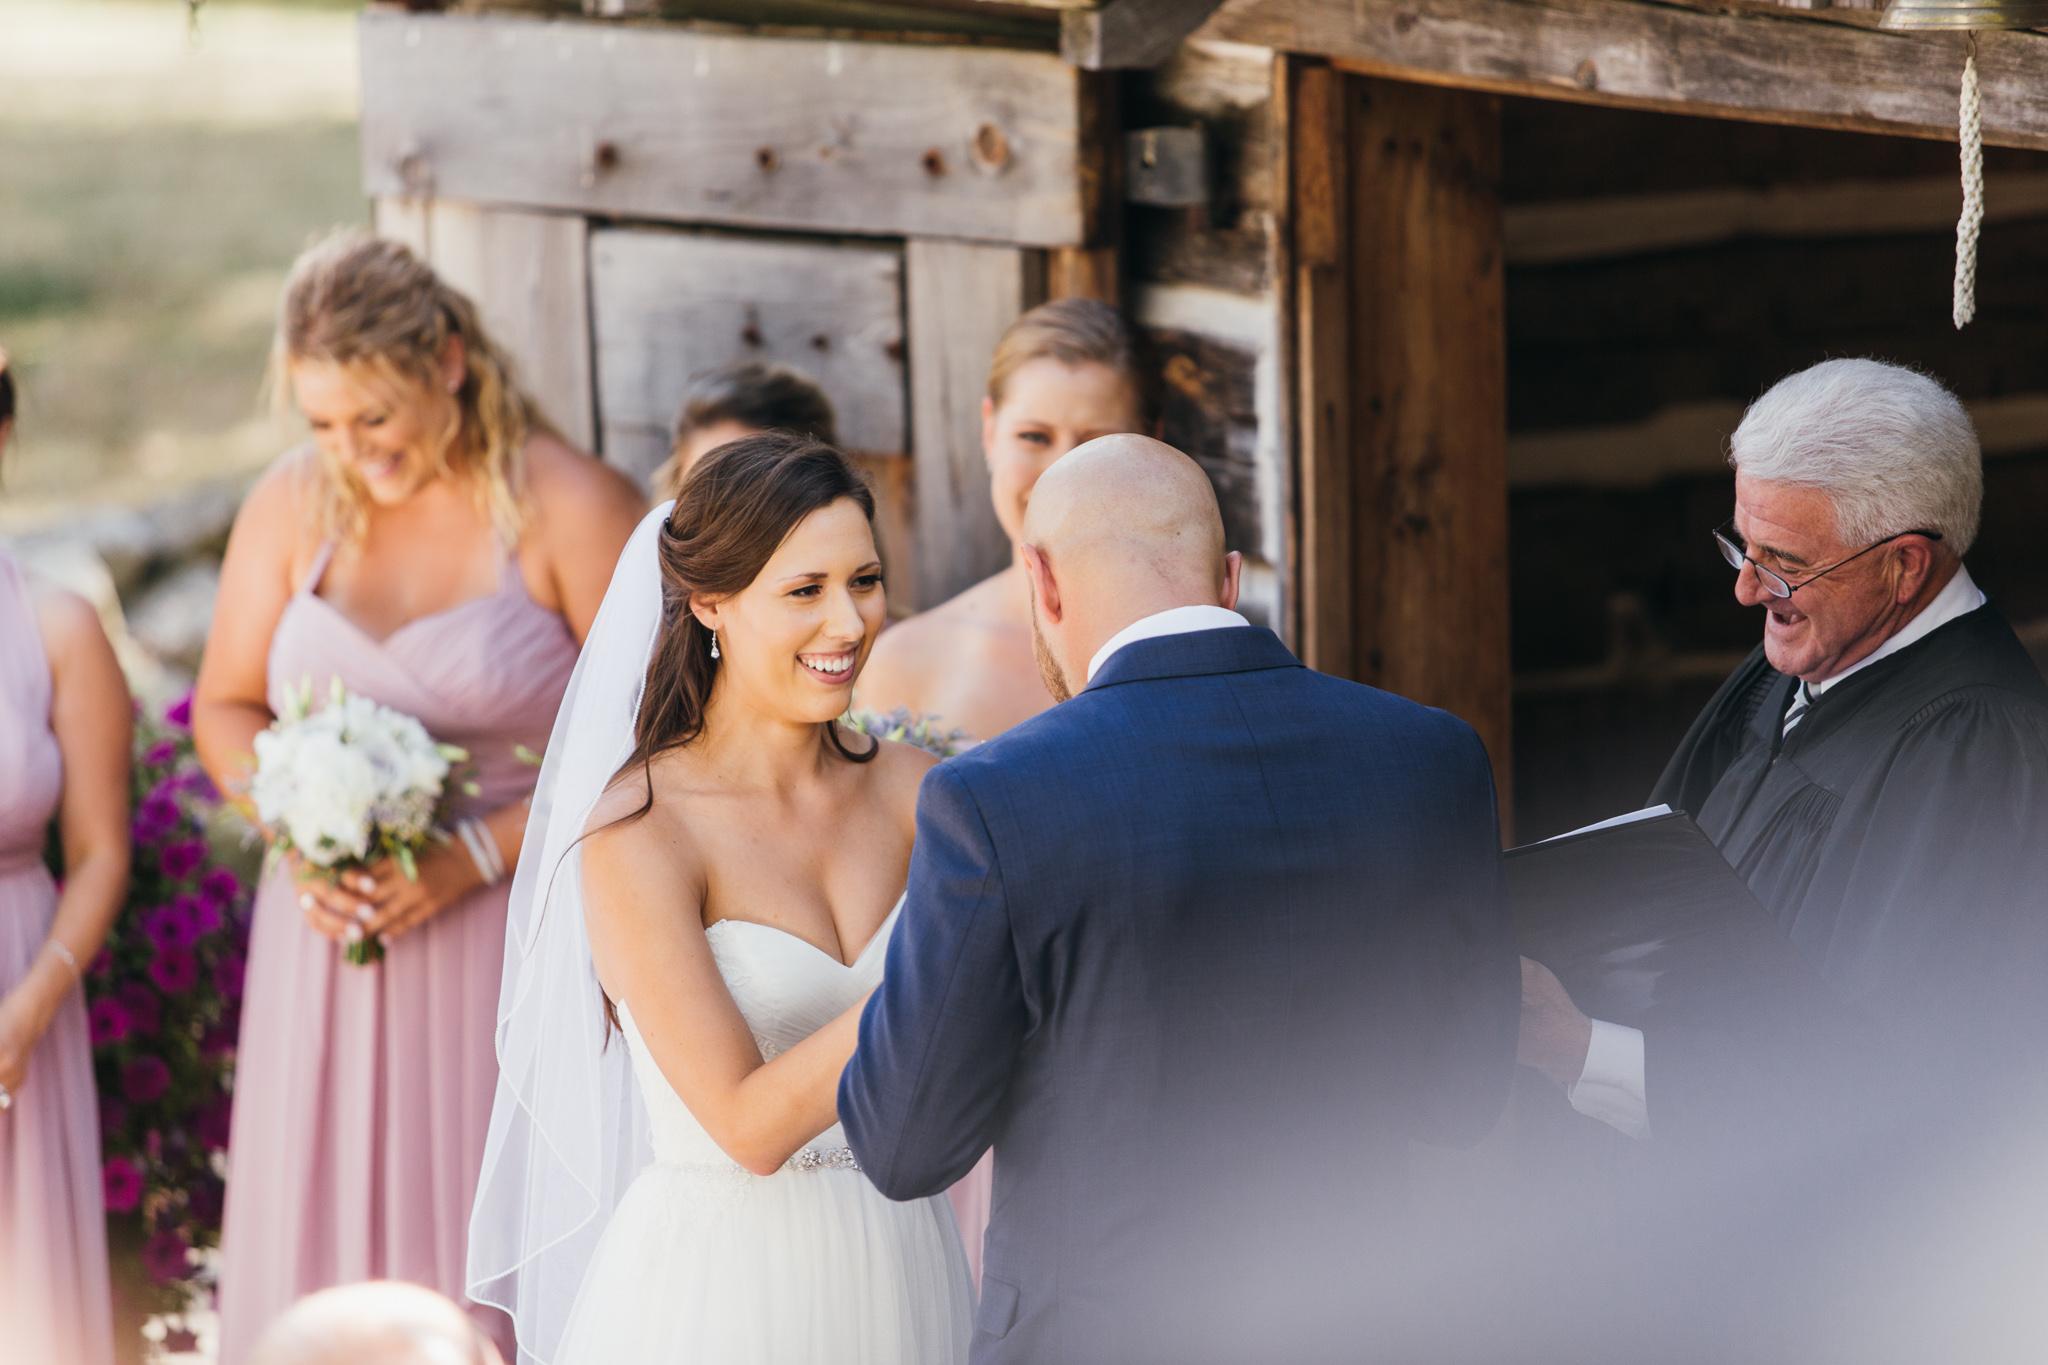 springer-house-burlington-wedding-photographer-269-of-756.jpg